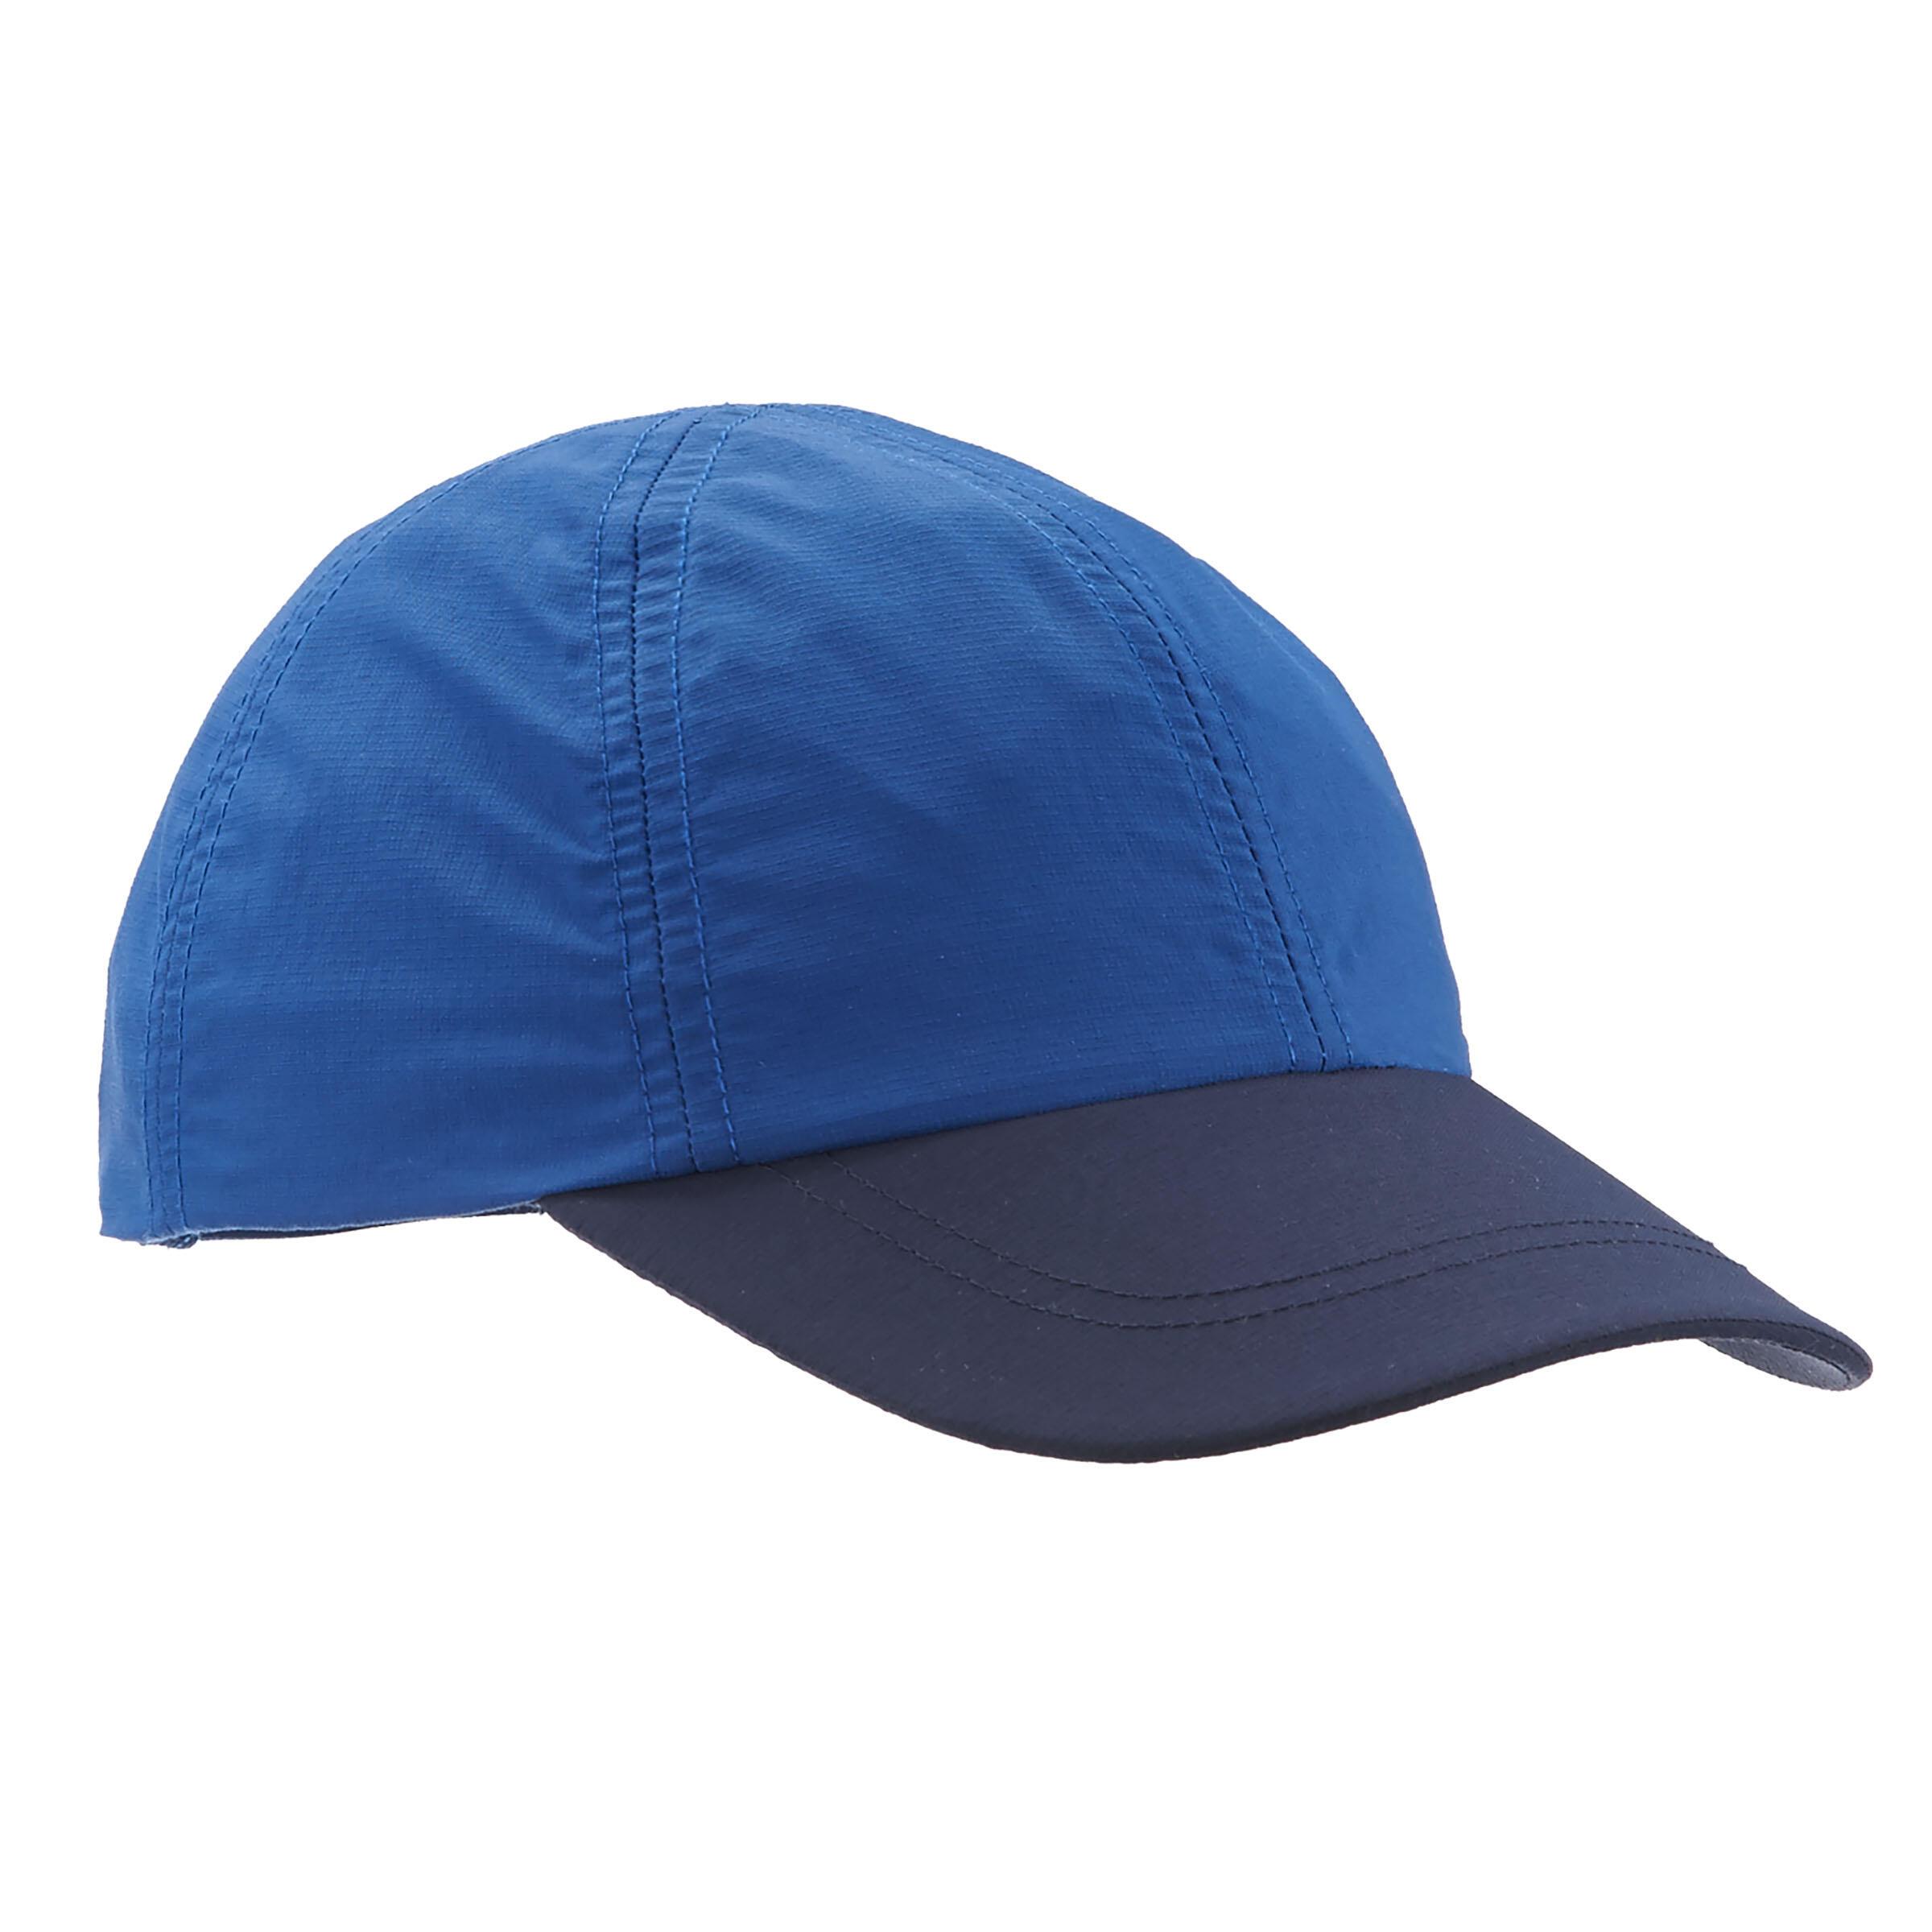 Șapcă Drumeție MH100 Copii